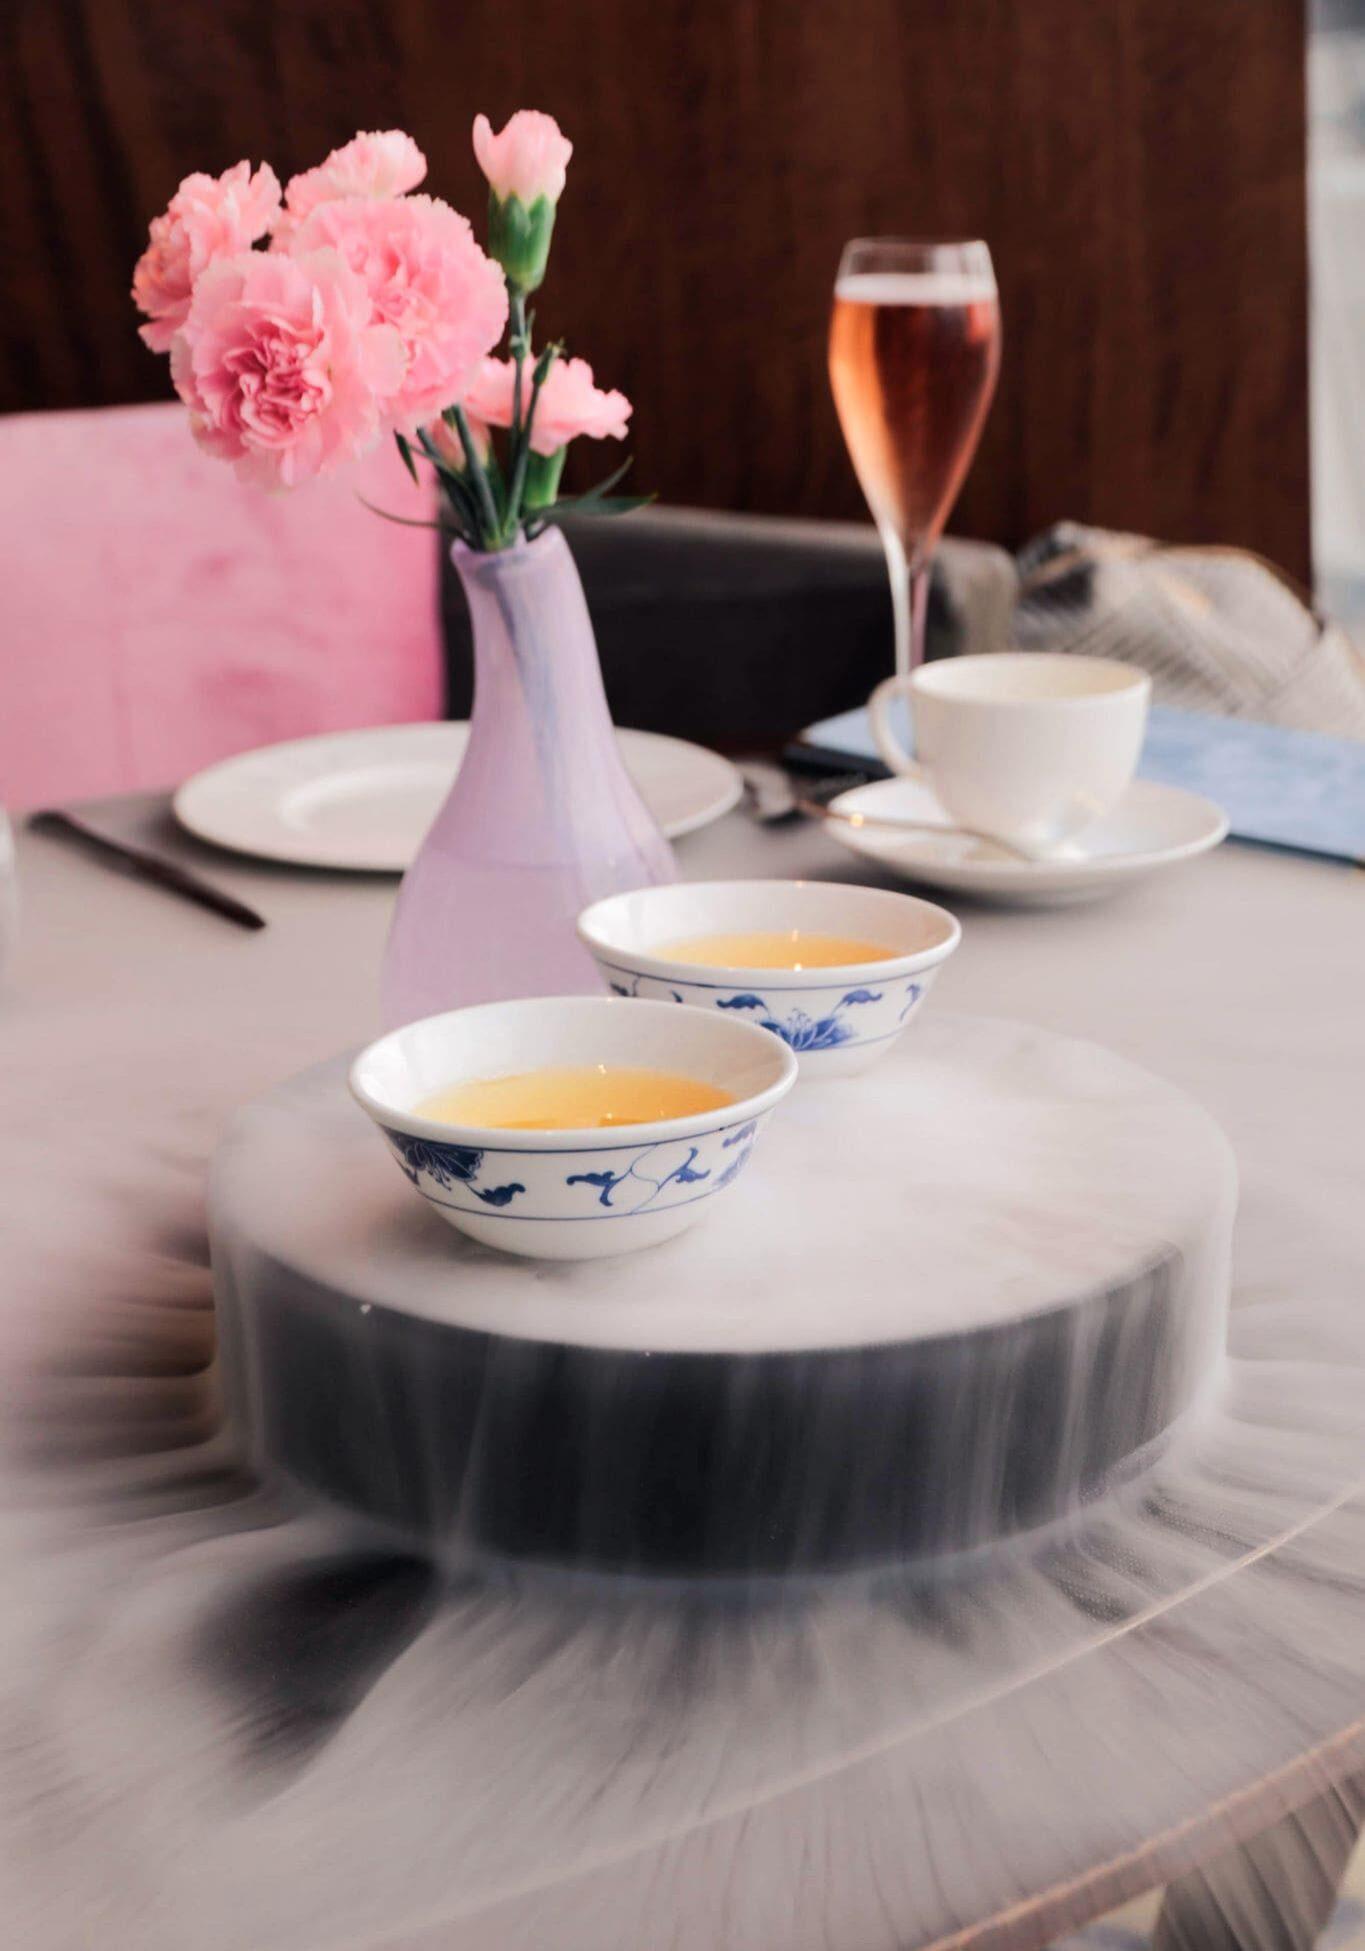 shangri la the shard ting afternoon tea